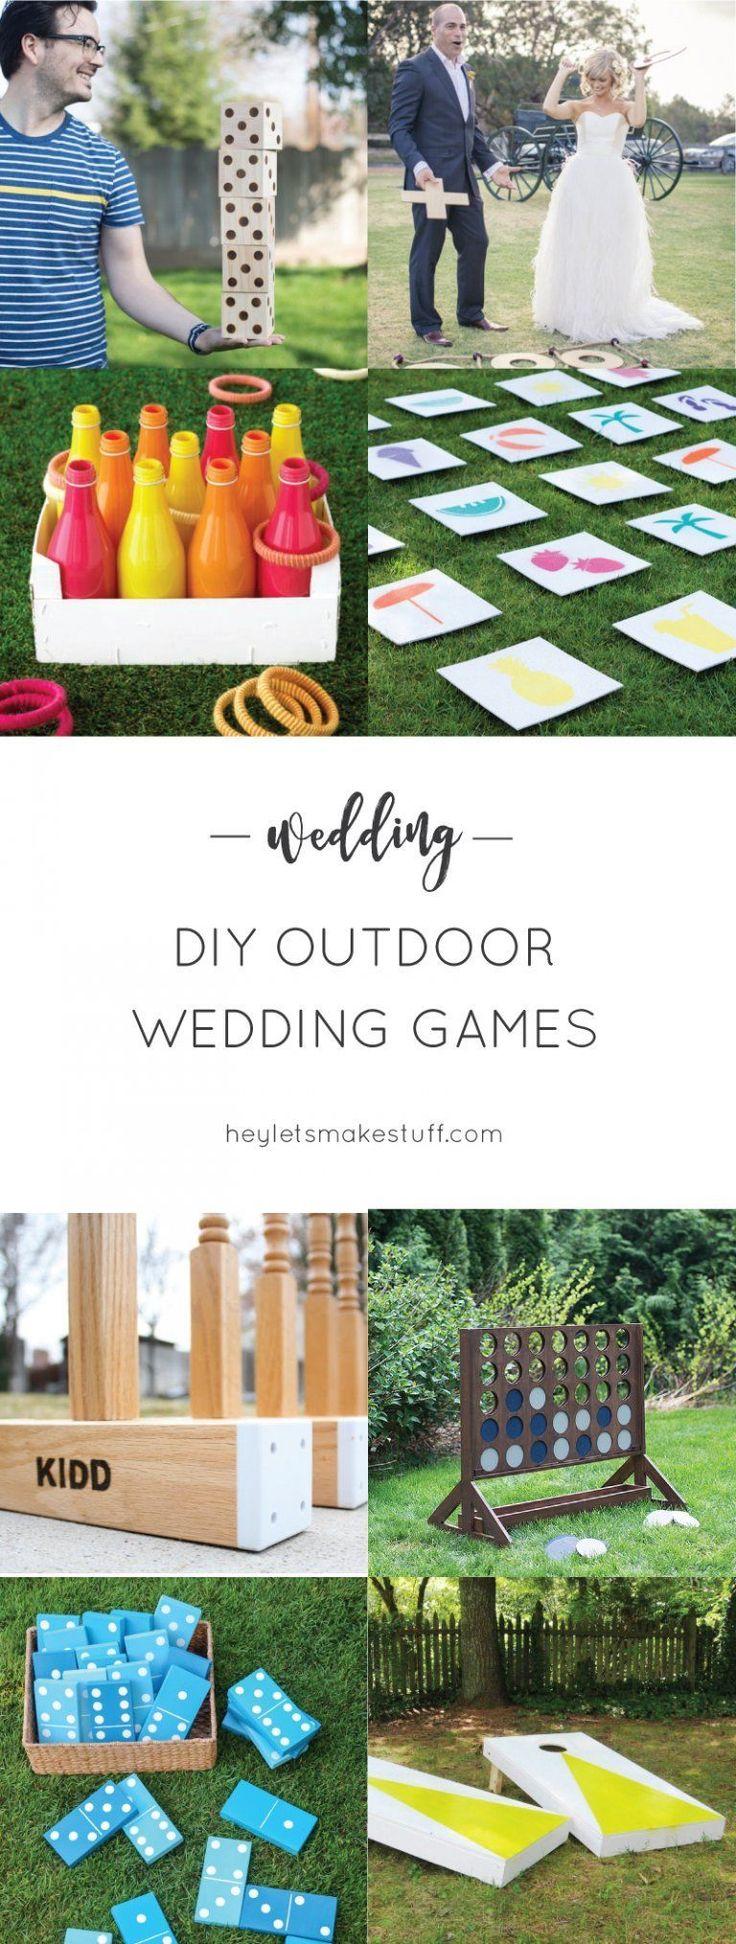 DIY Outdoor Wedding Games If you're having an …